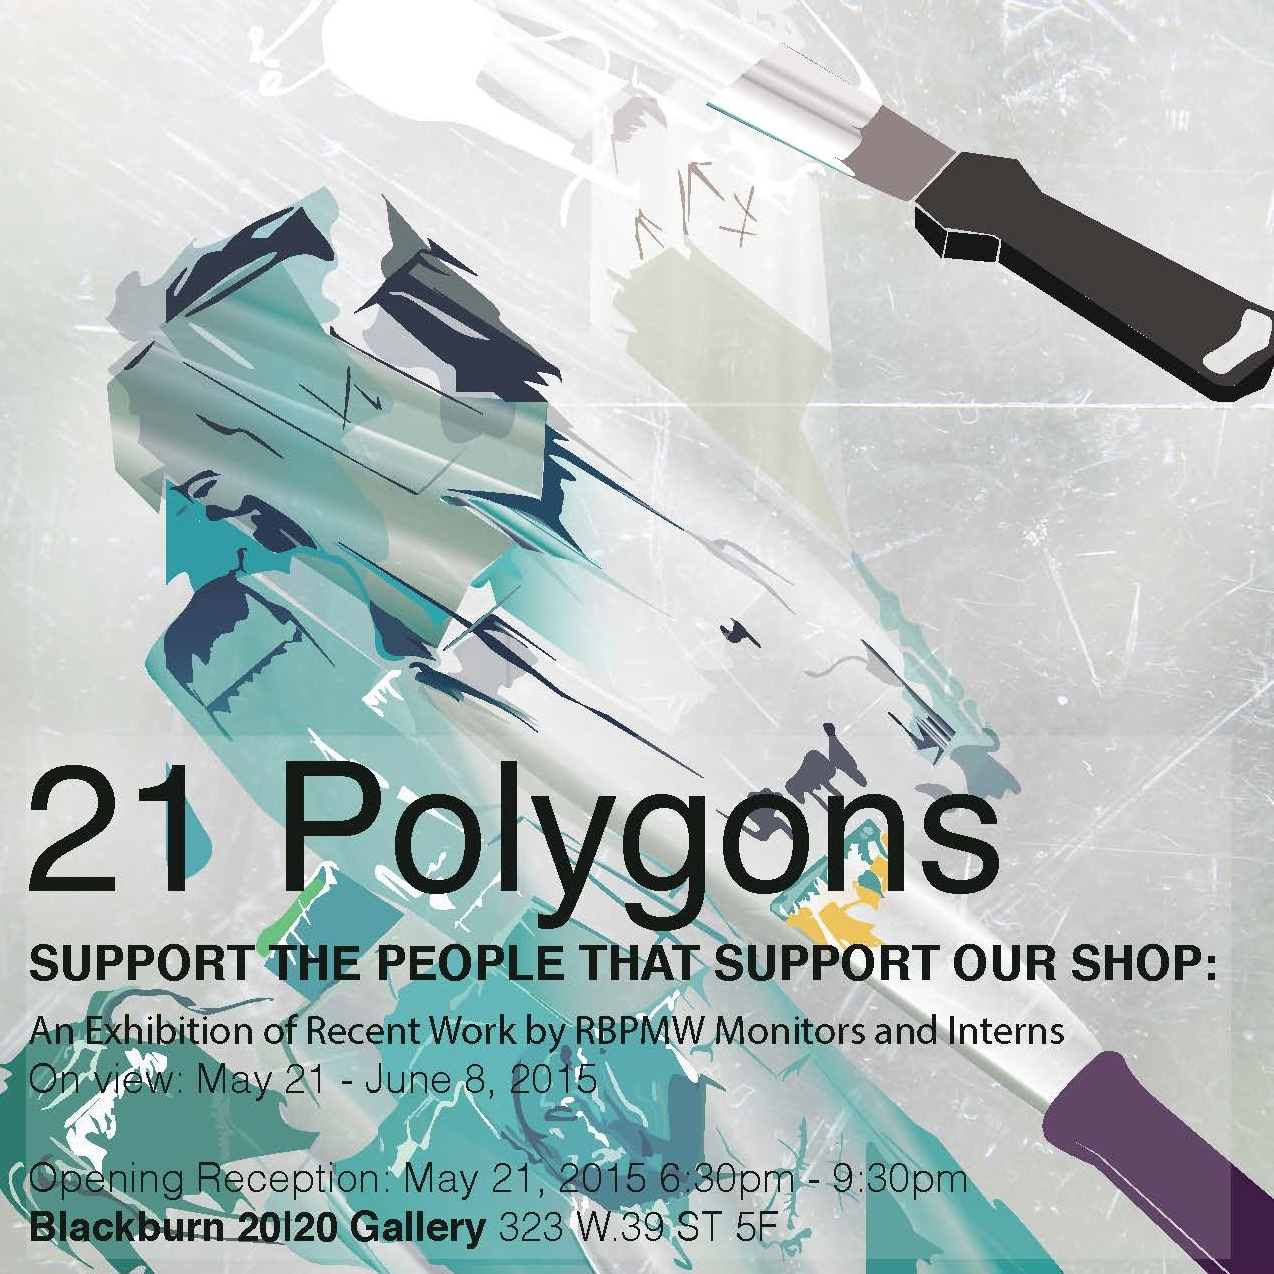 21 Polygons   May 21 - June 8